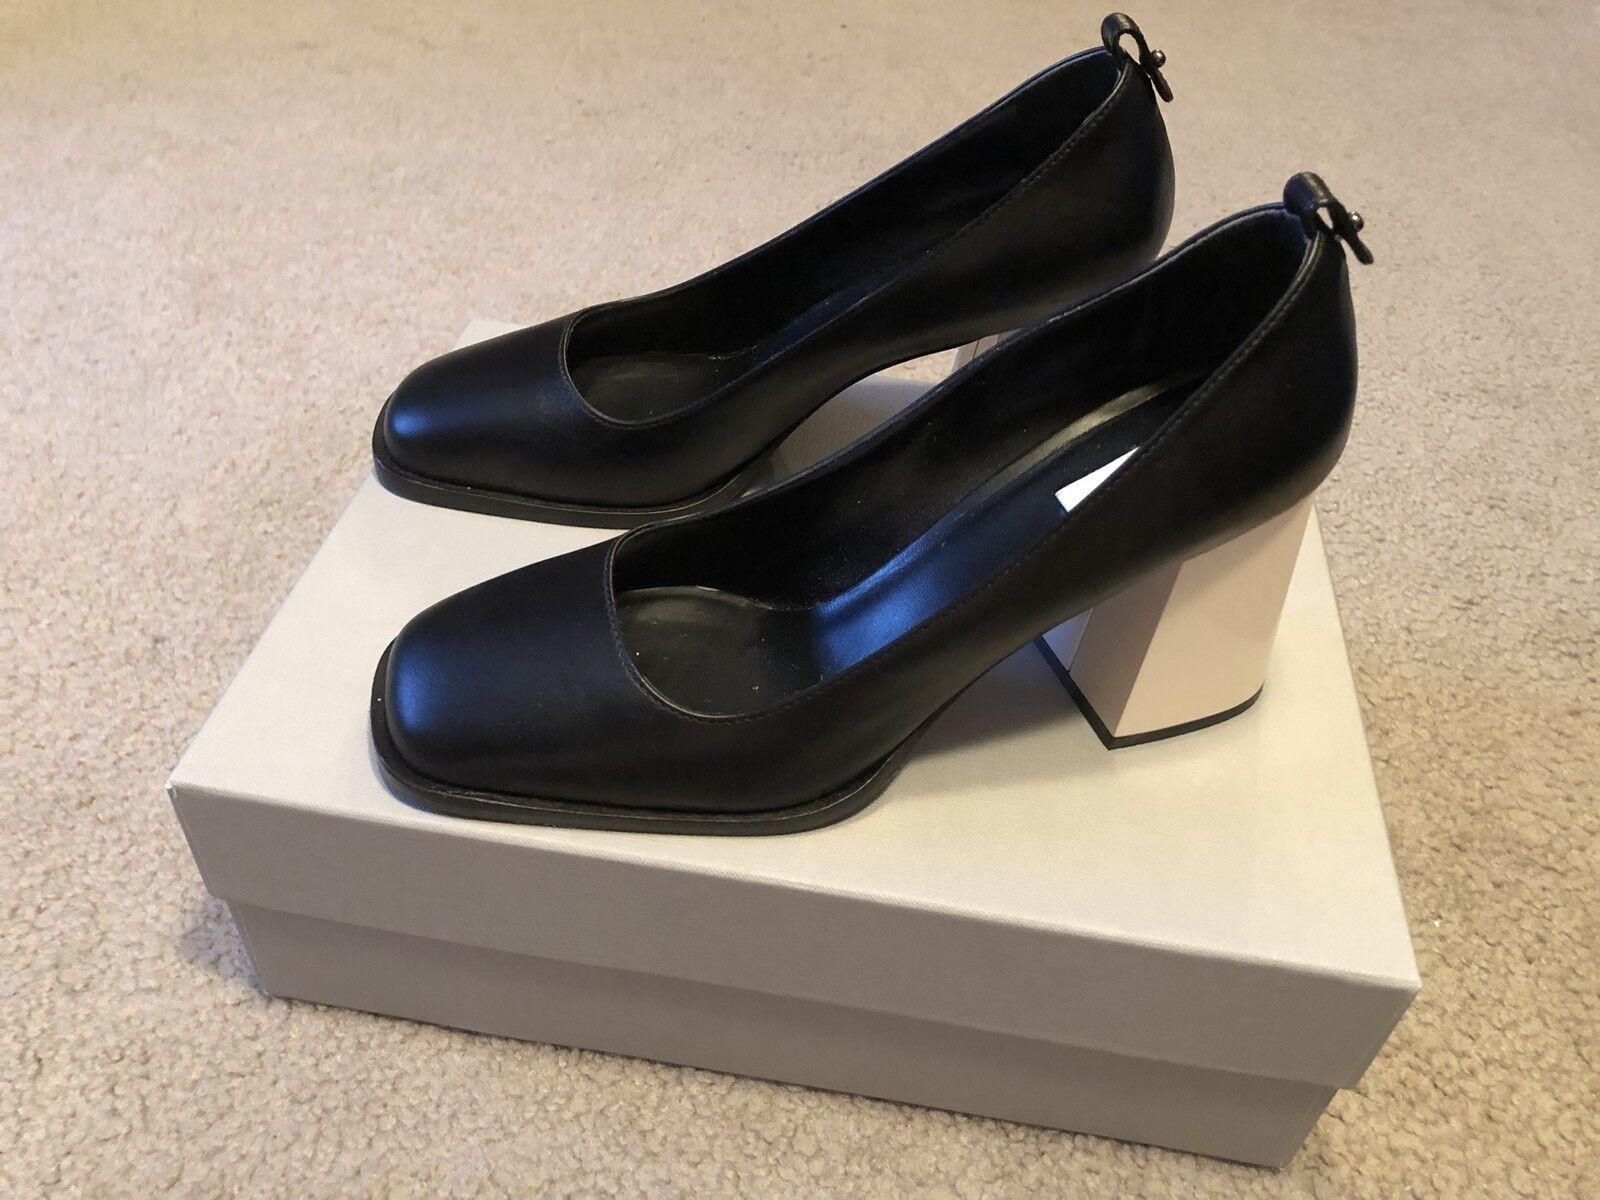 MaxMara scarpe  Leather Orig  670 nero bianca Heels  SZ 38 US SZ 8  centro commerciale di moda